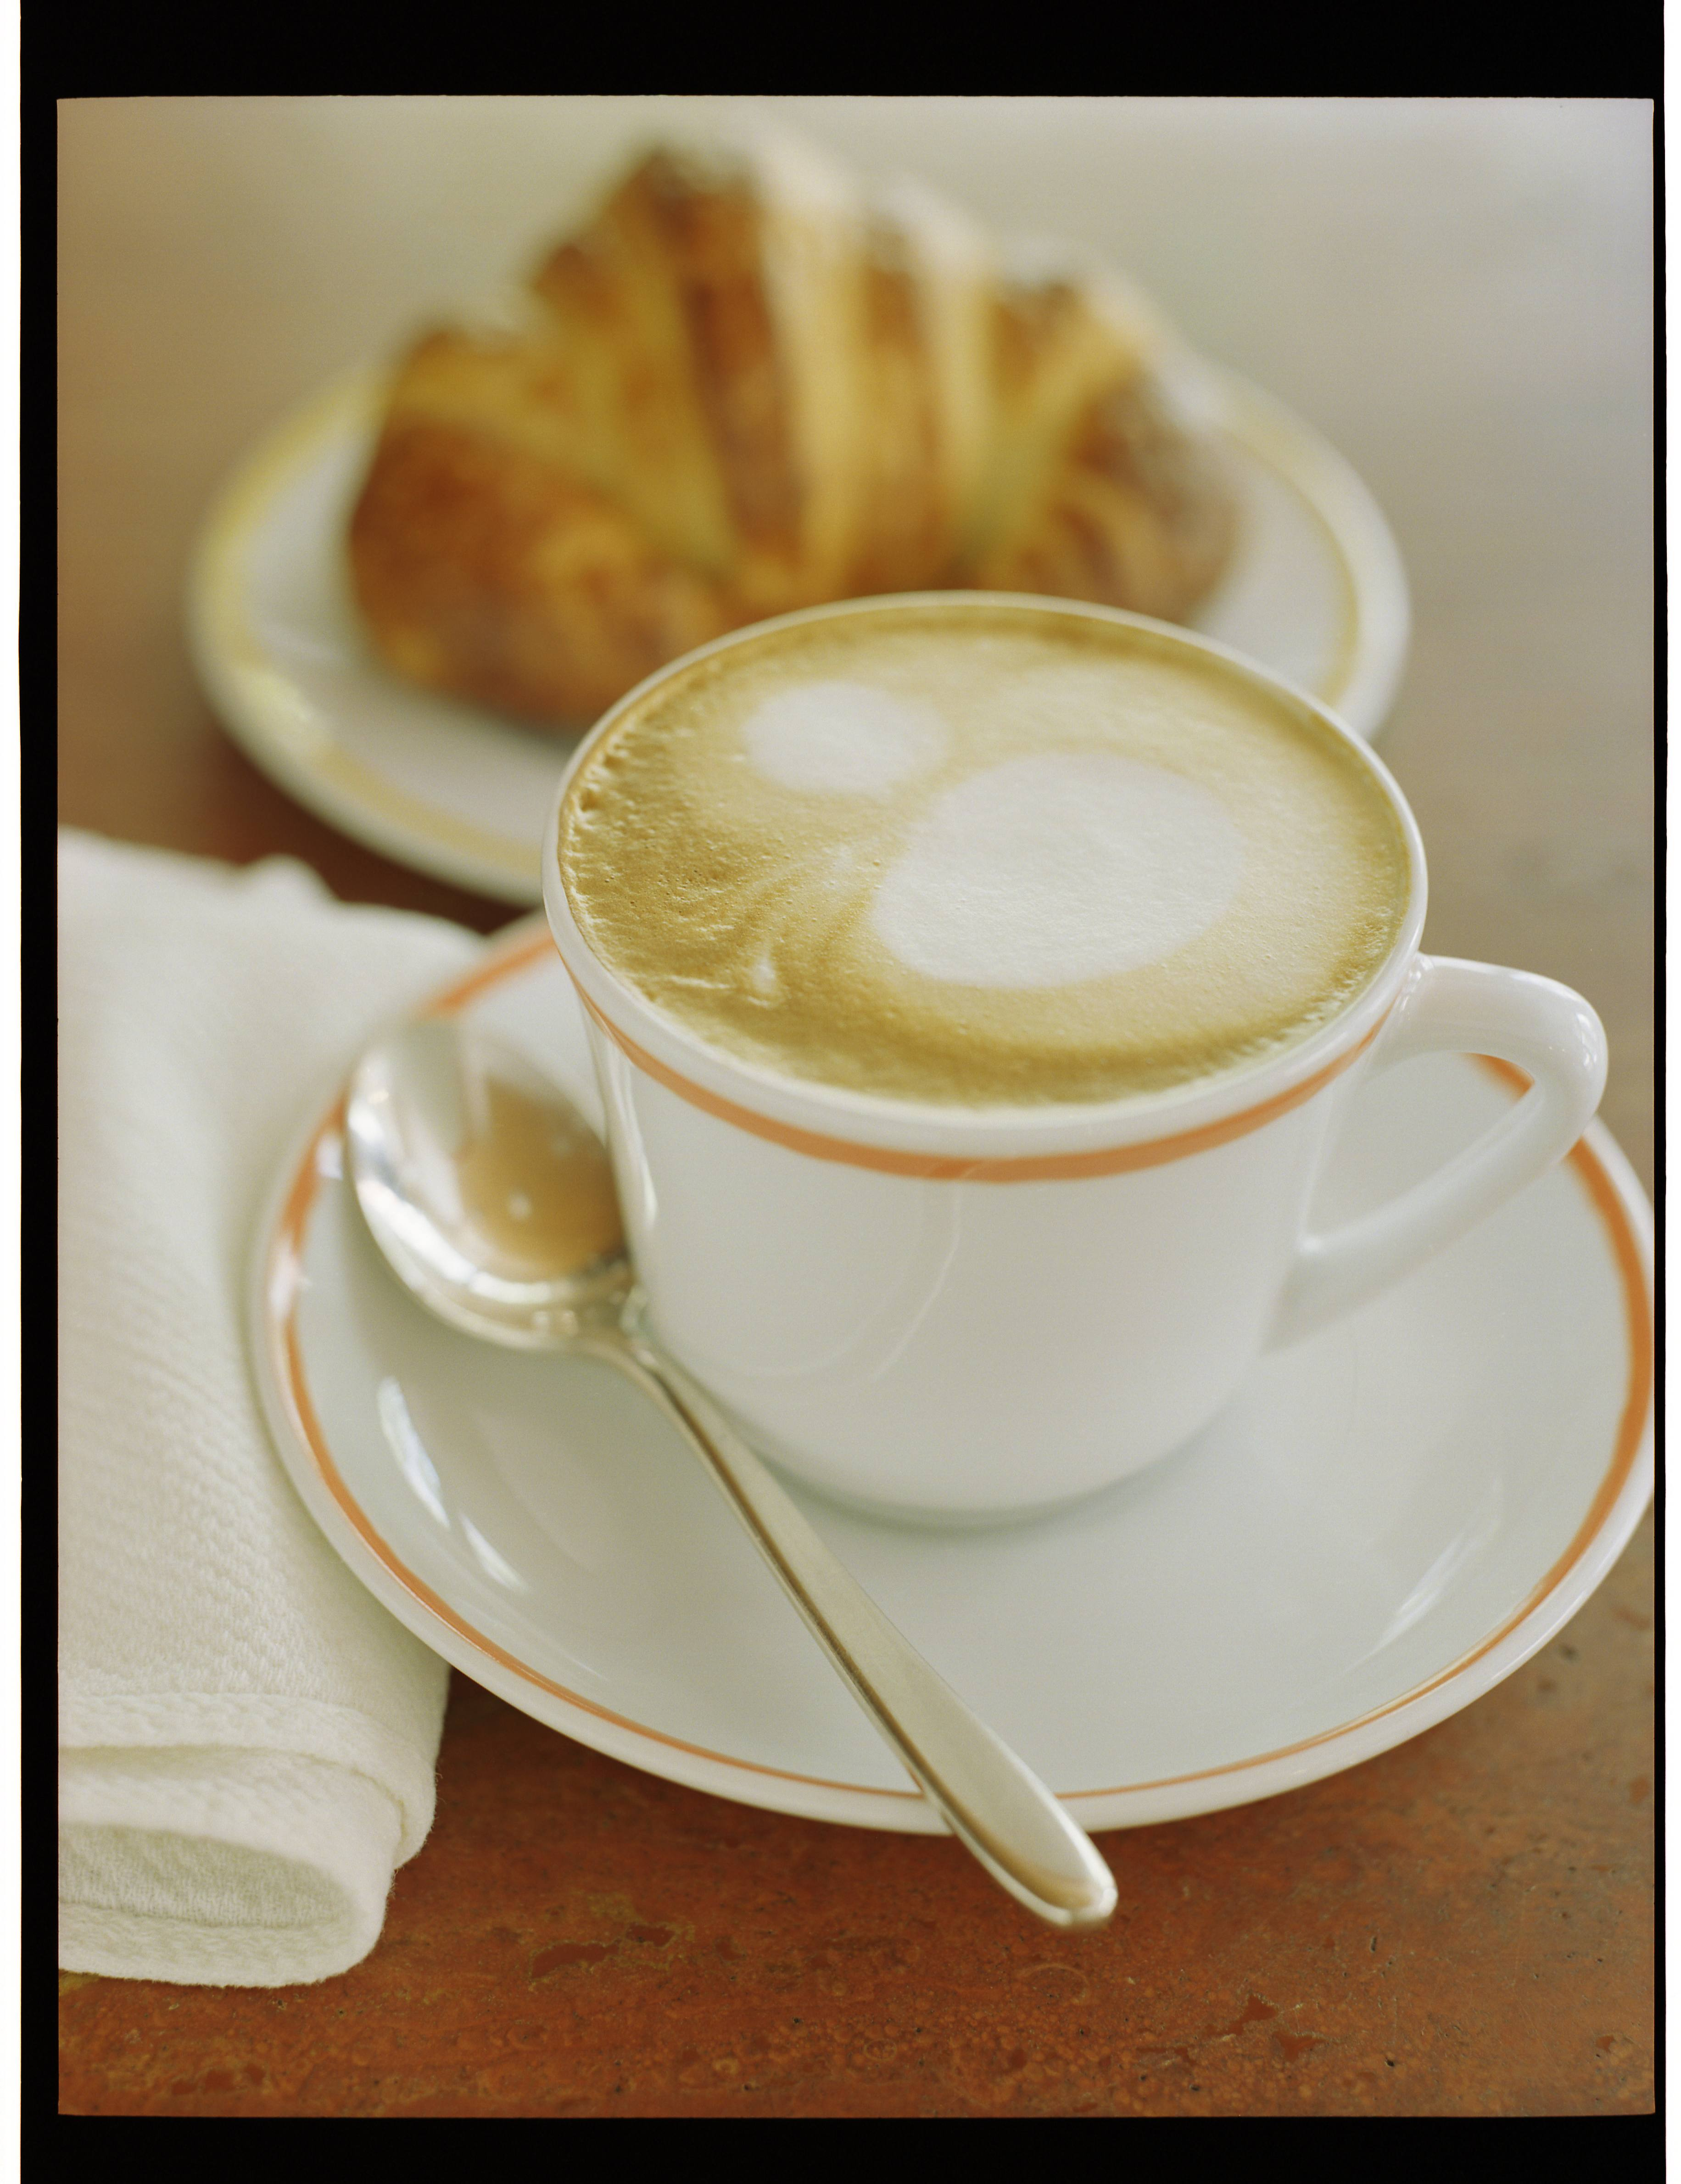 2011-02-09-Cappuccino.jpg